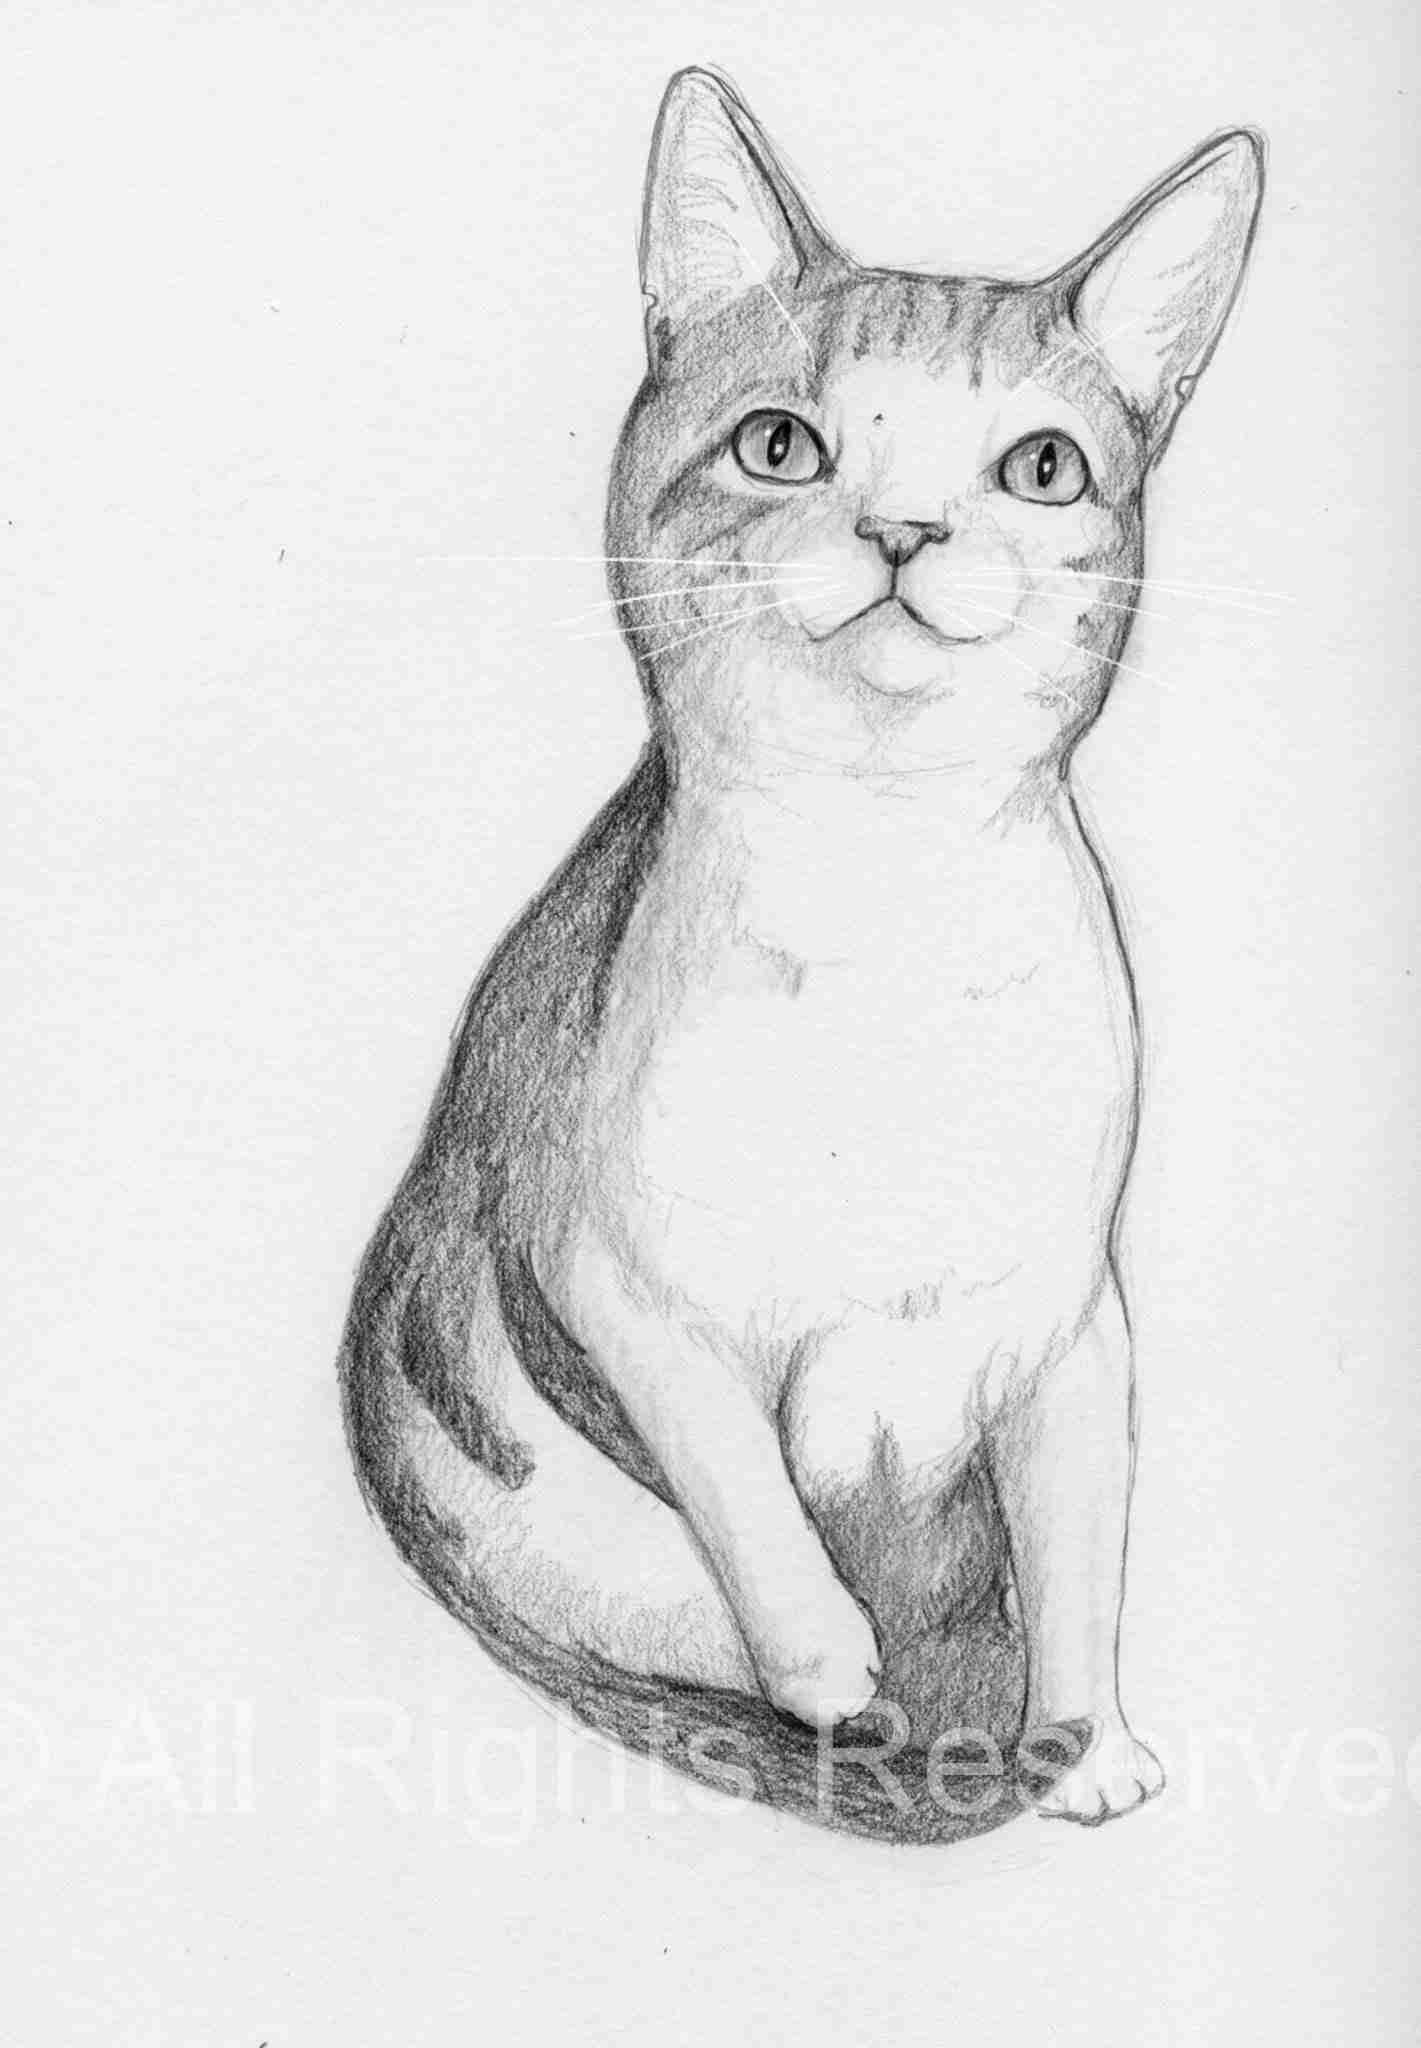 Cat Doodle 39 – Sugar [Adopted!]